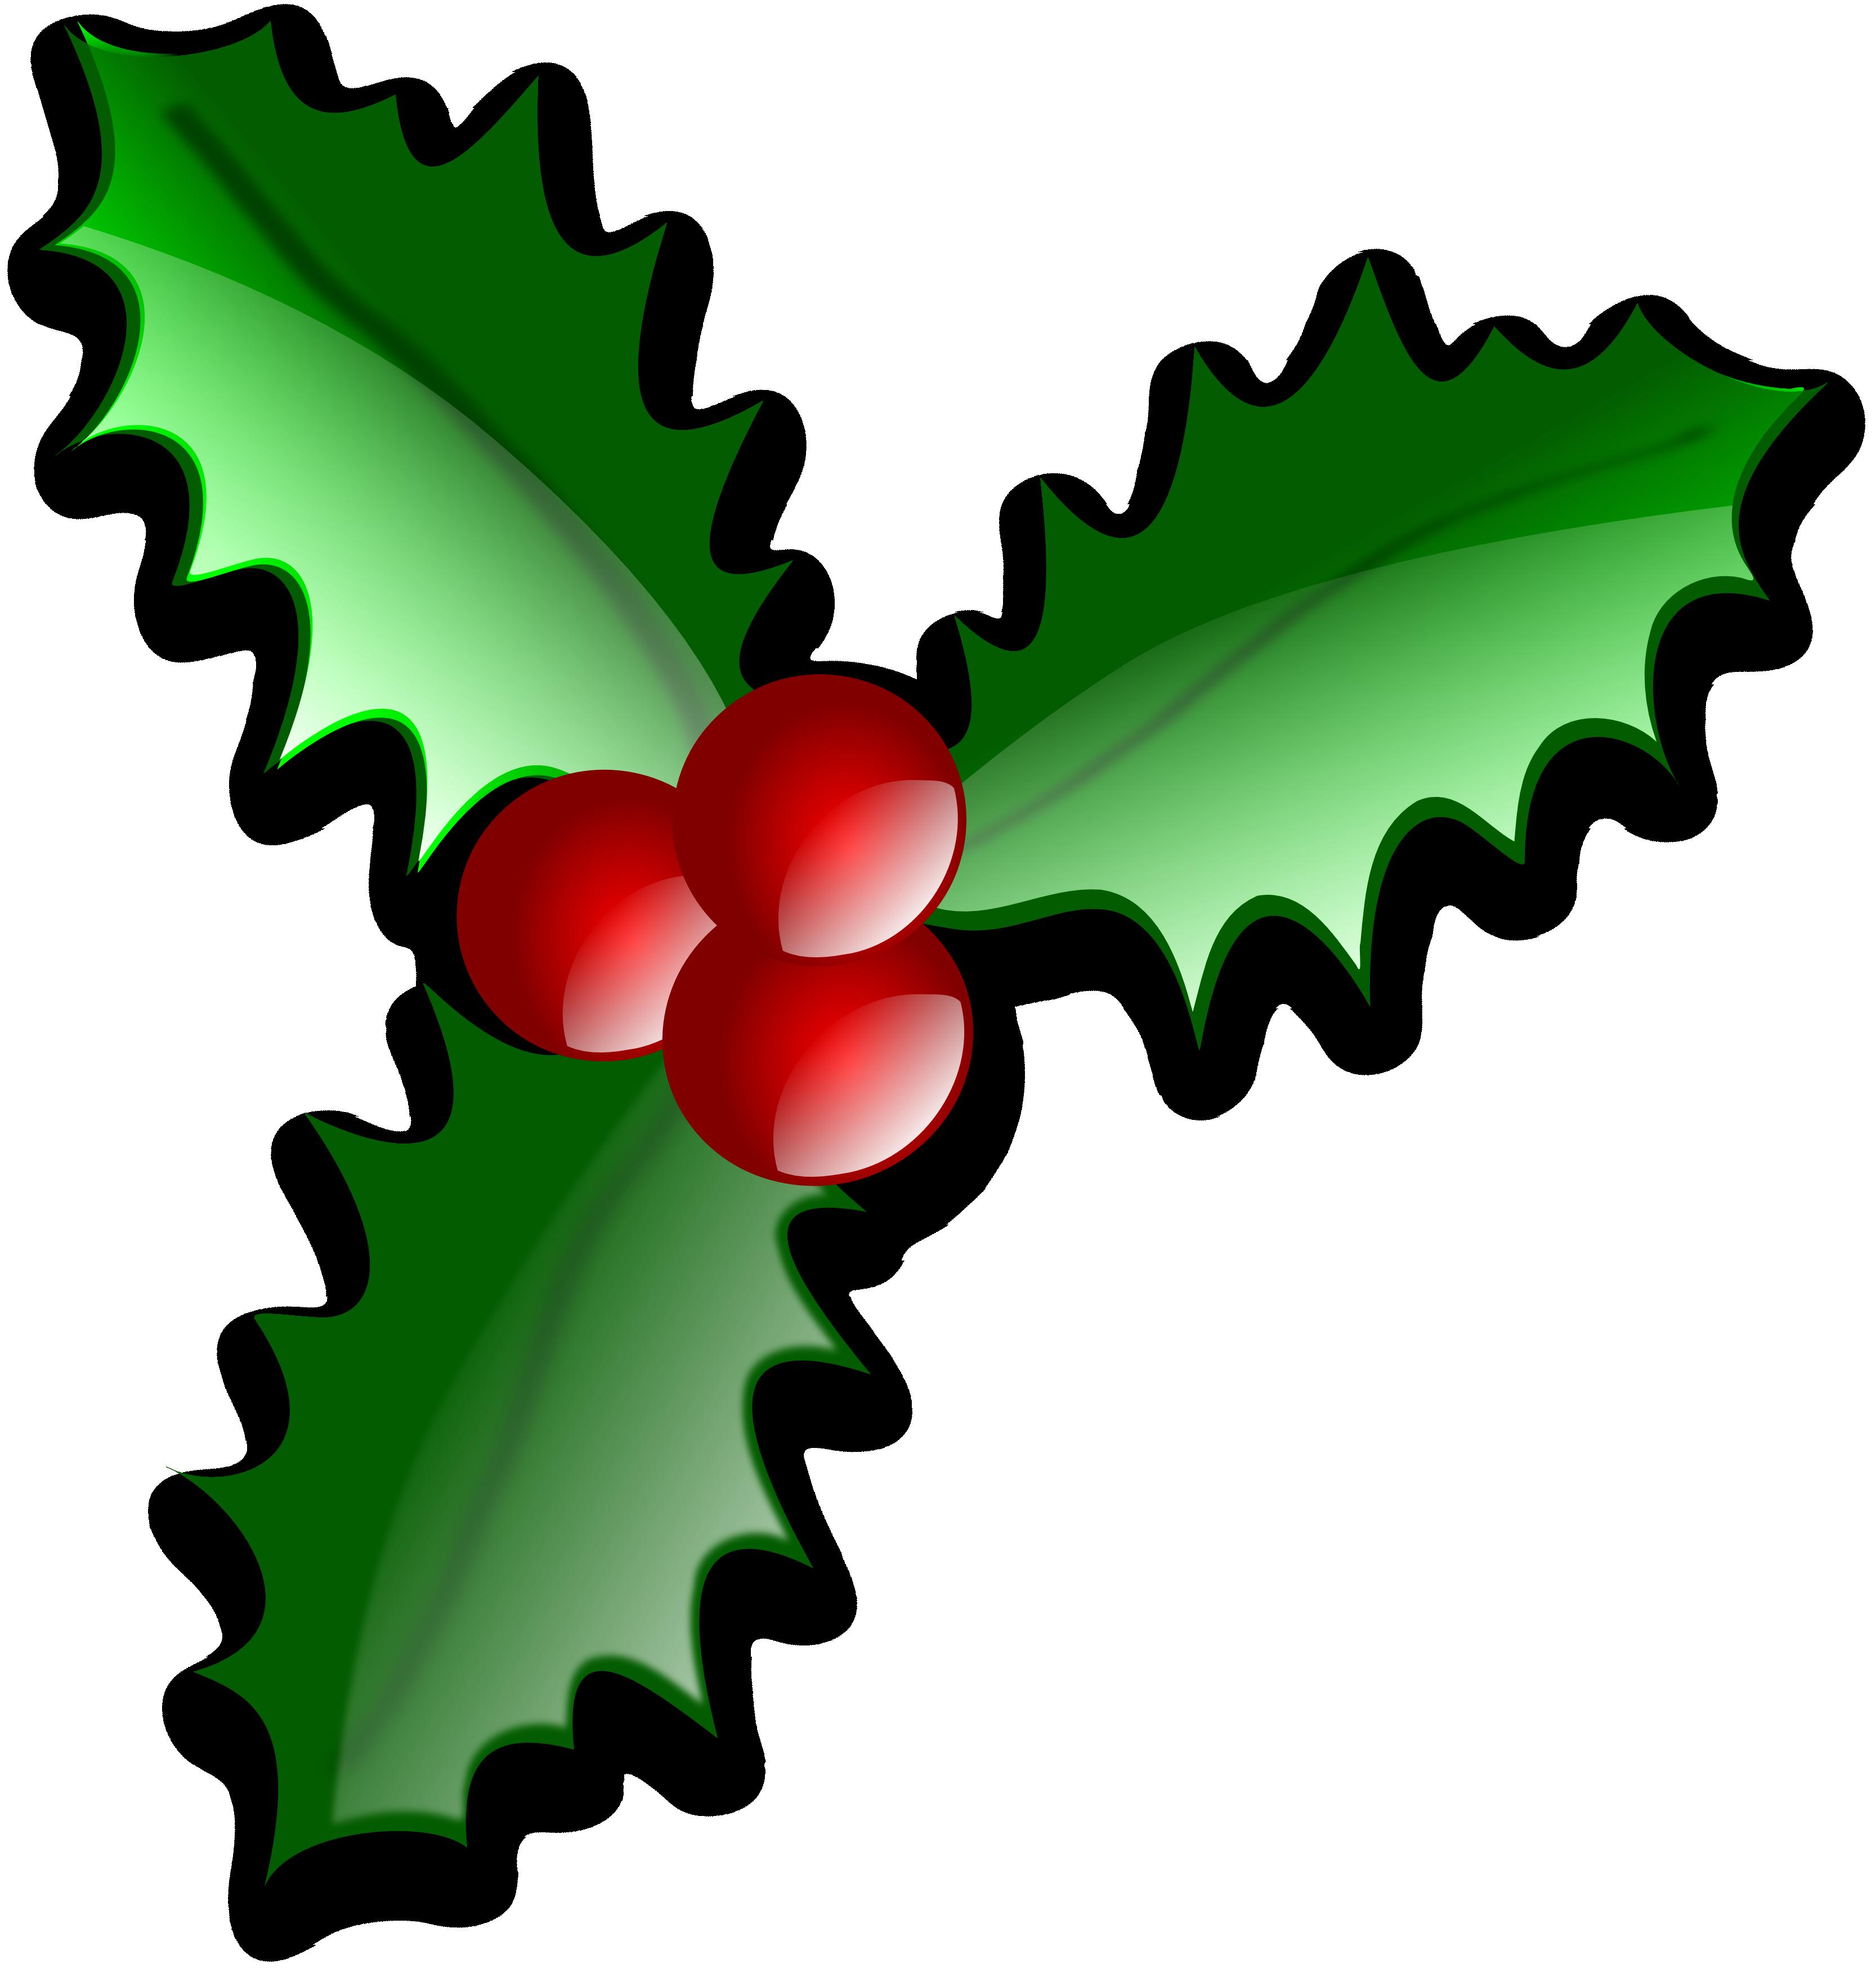 free christmas clip art holly christmas holly clipart holly rh pinterest co uk christmas holly clipart border christmas holly clipart free